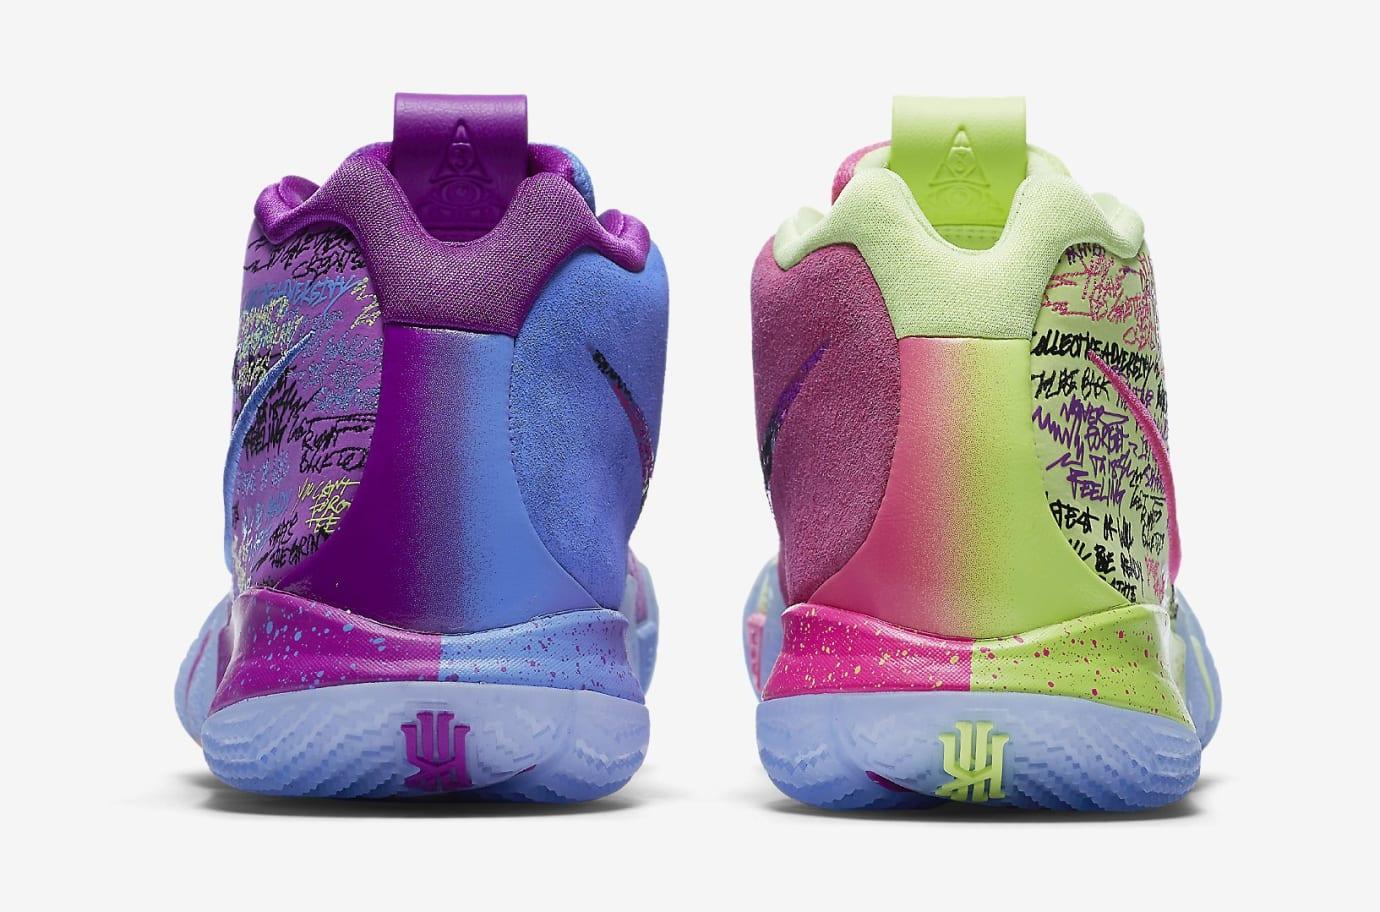 Nike Kyrie 4 Confetti Multicolor Yellow Purple Release Date 943806-900 Heel